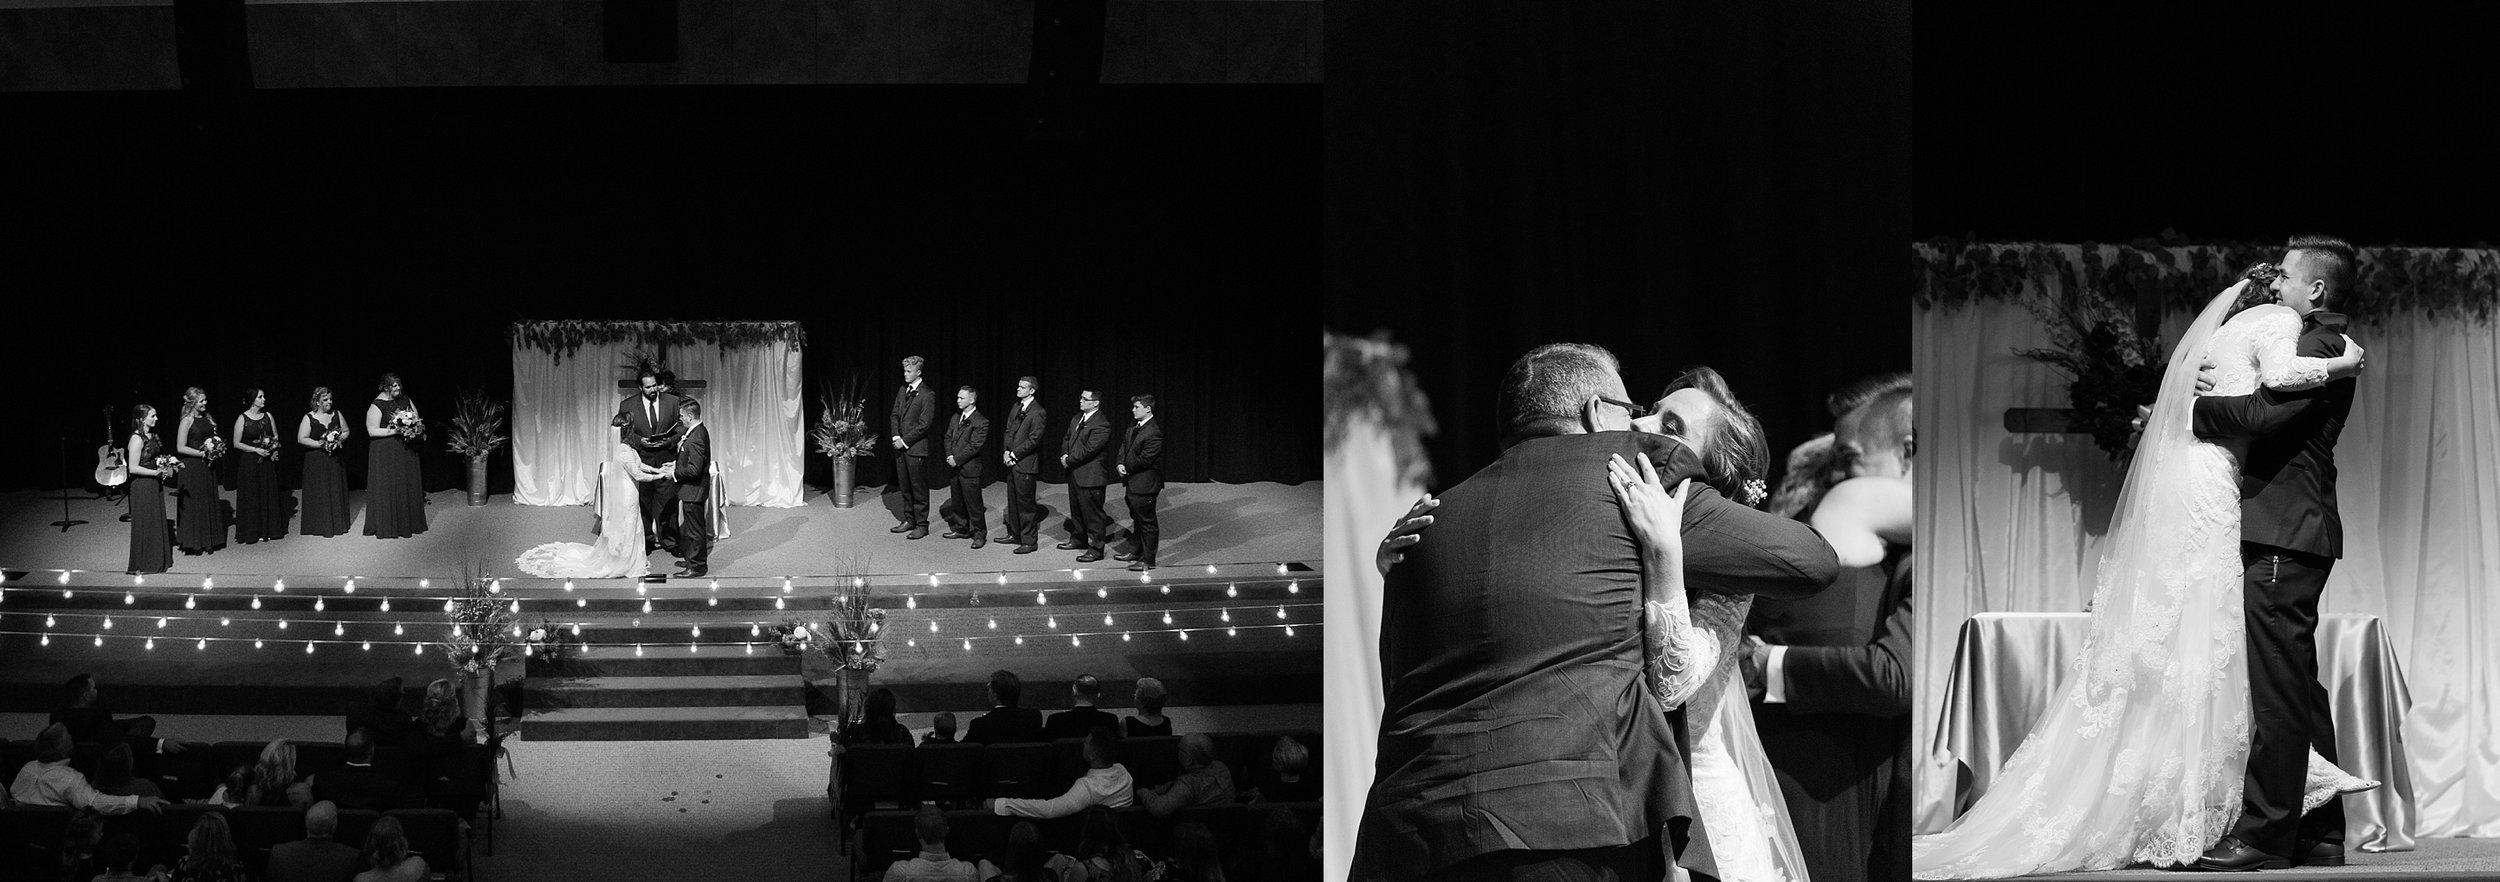 Greentree Church Wedding in Rolla Missouri -Komorebi Photography